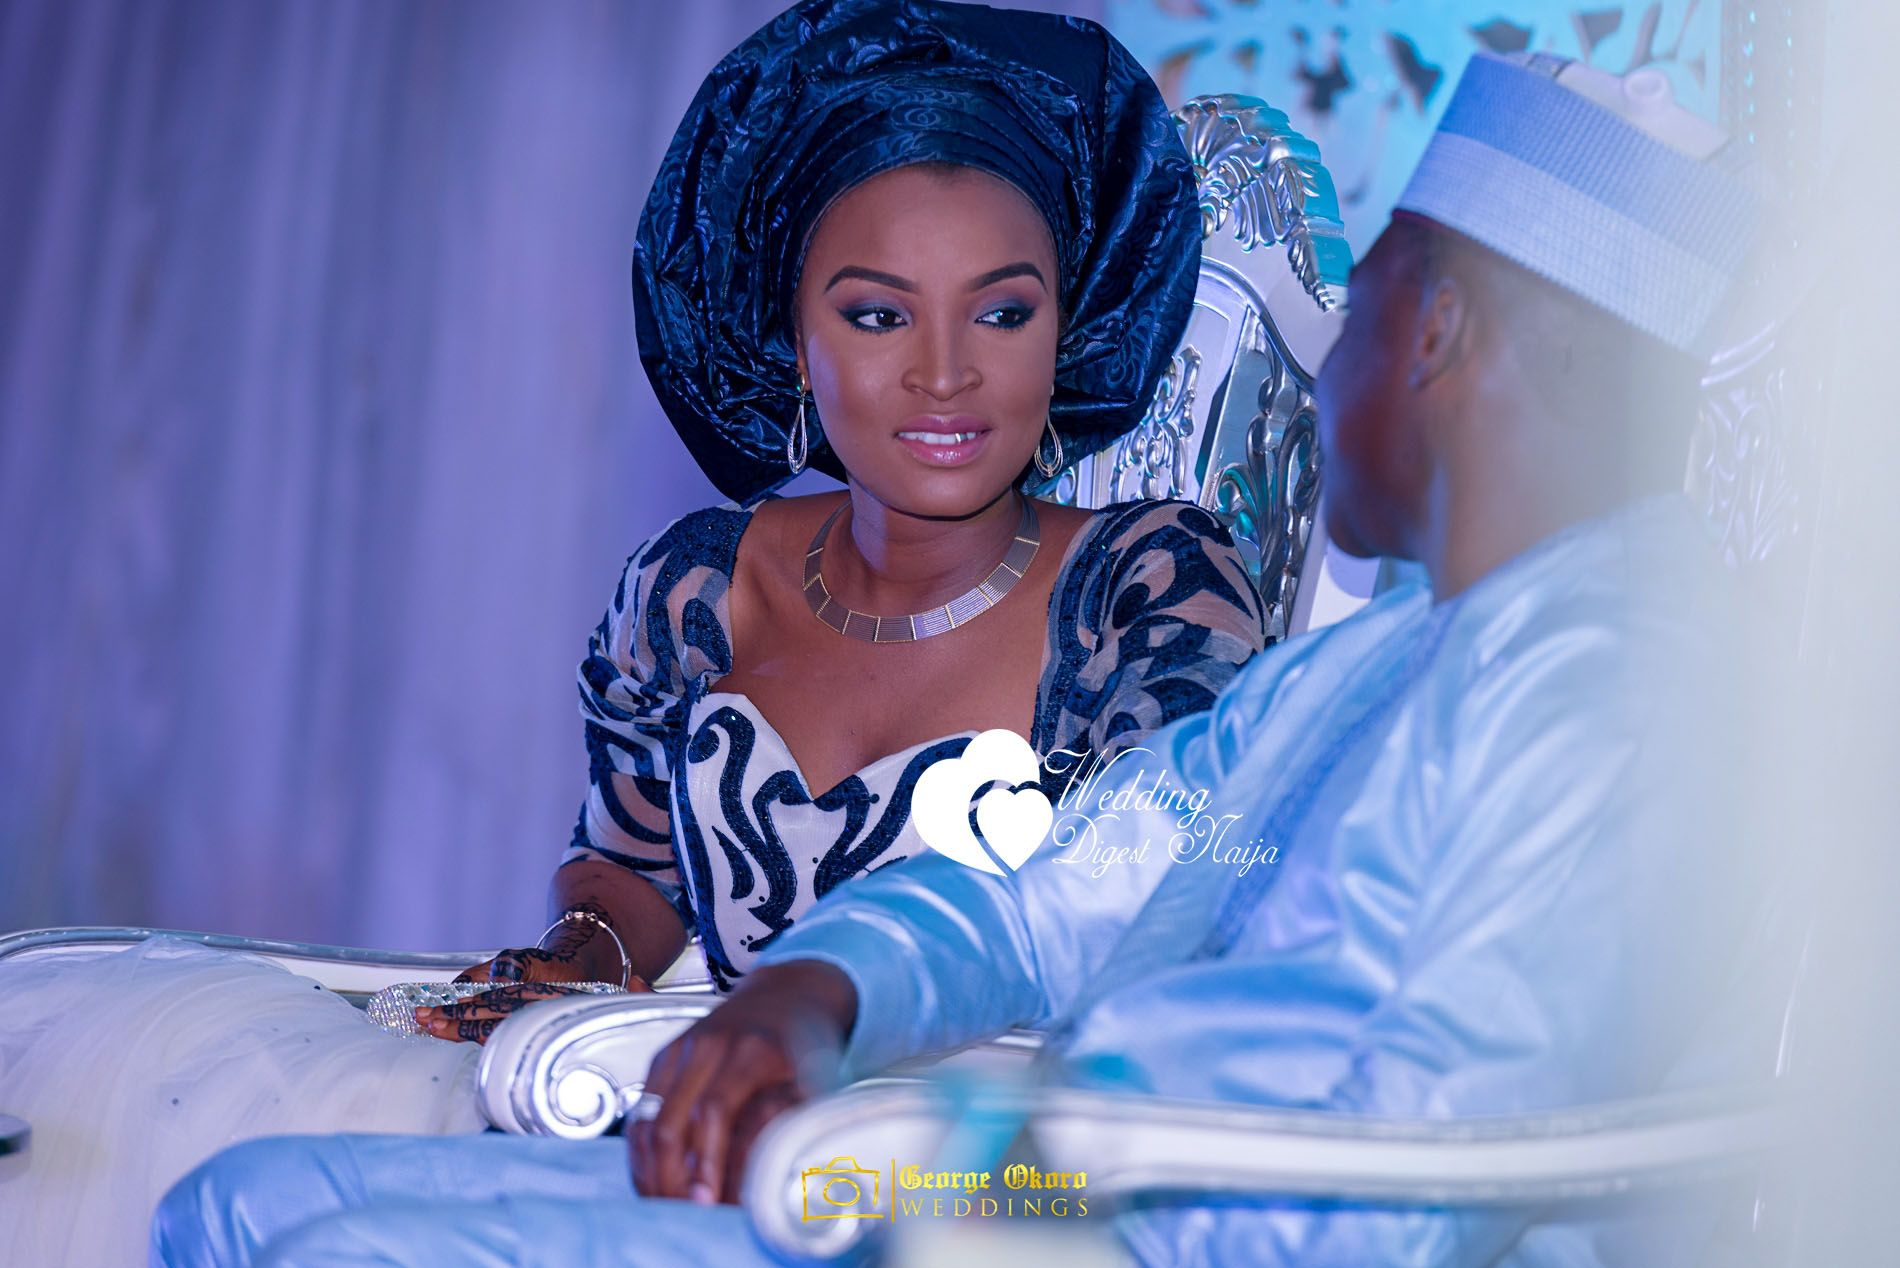 George okorojpg mariage traditionnelle pinterest nigerian